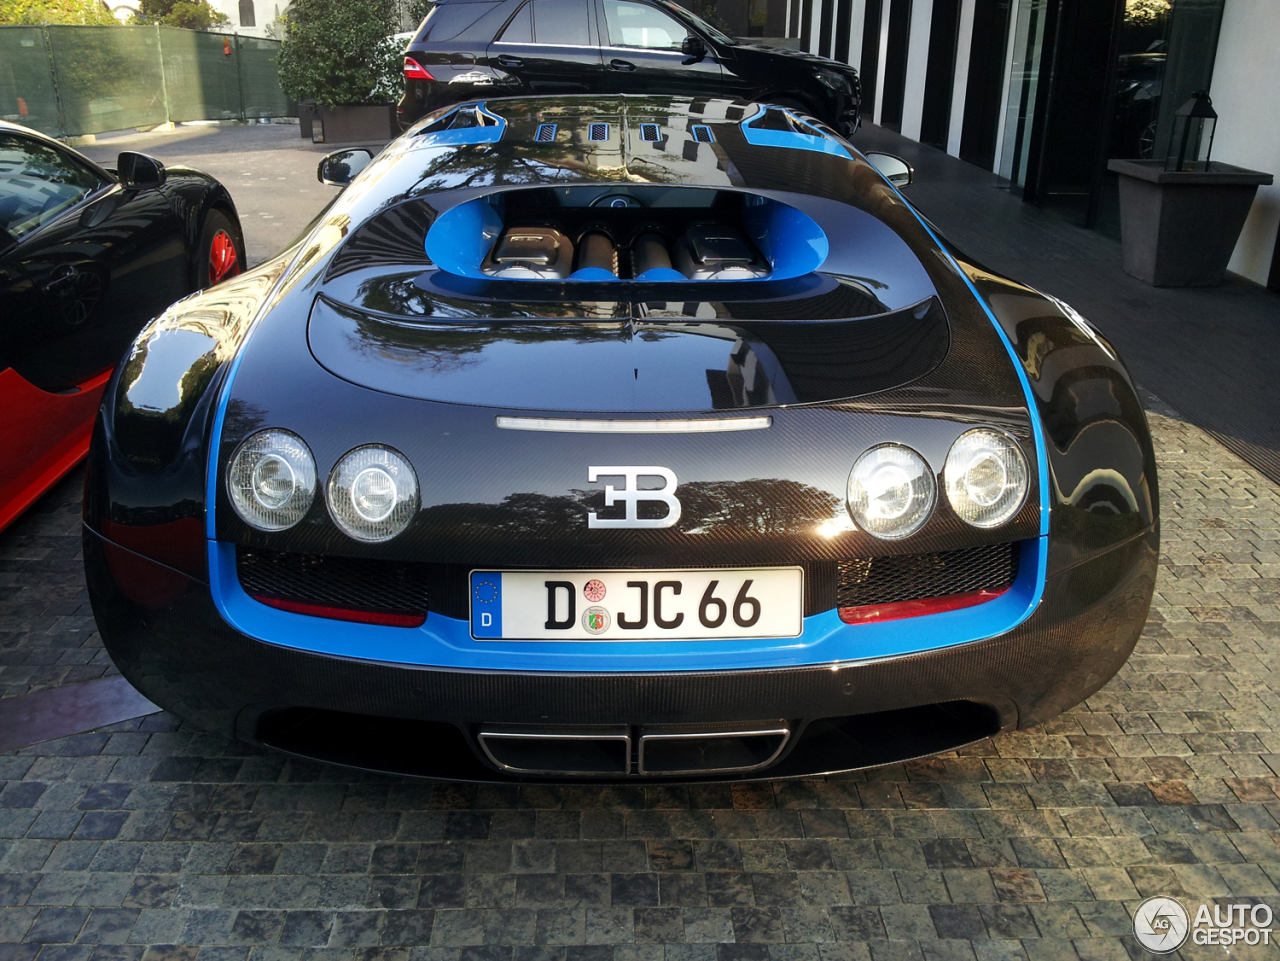 bugatti veyron 16 4 super sport edition merveilleux 2 november 2014 autog. Black Bedroom Furniture Sets. Home Design Ideas